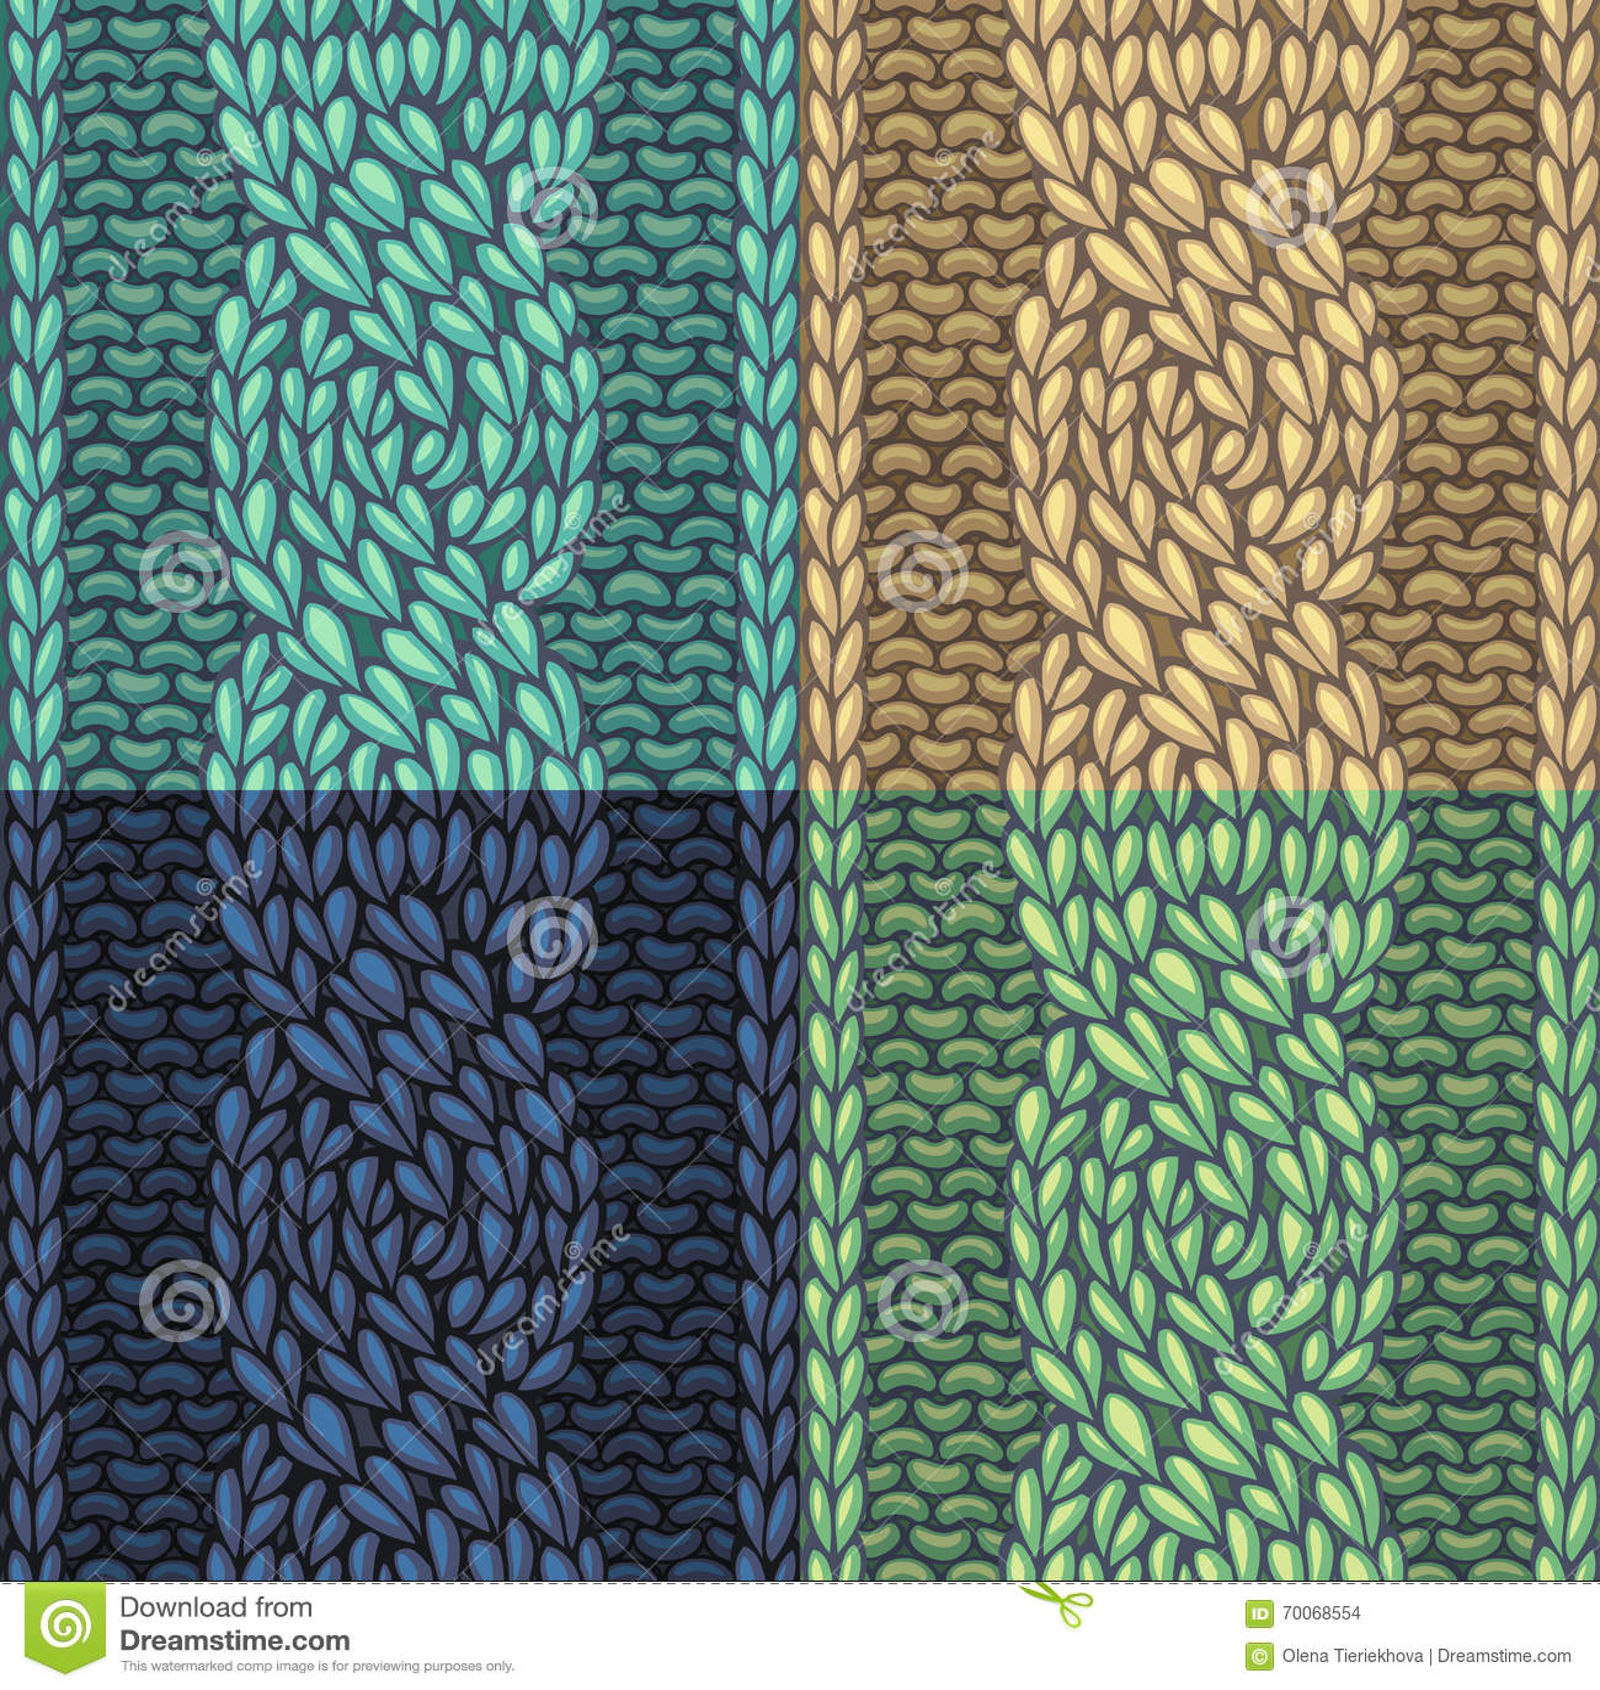 Set Of Six-Stitch Cable Stitch Patterns. Stock Vector - Illustration ...